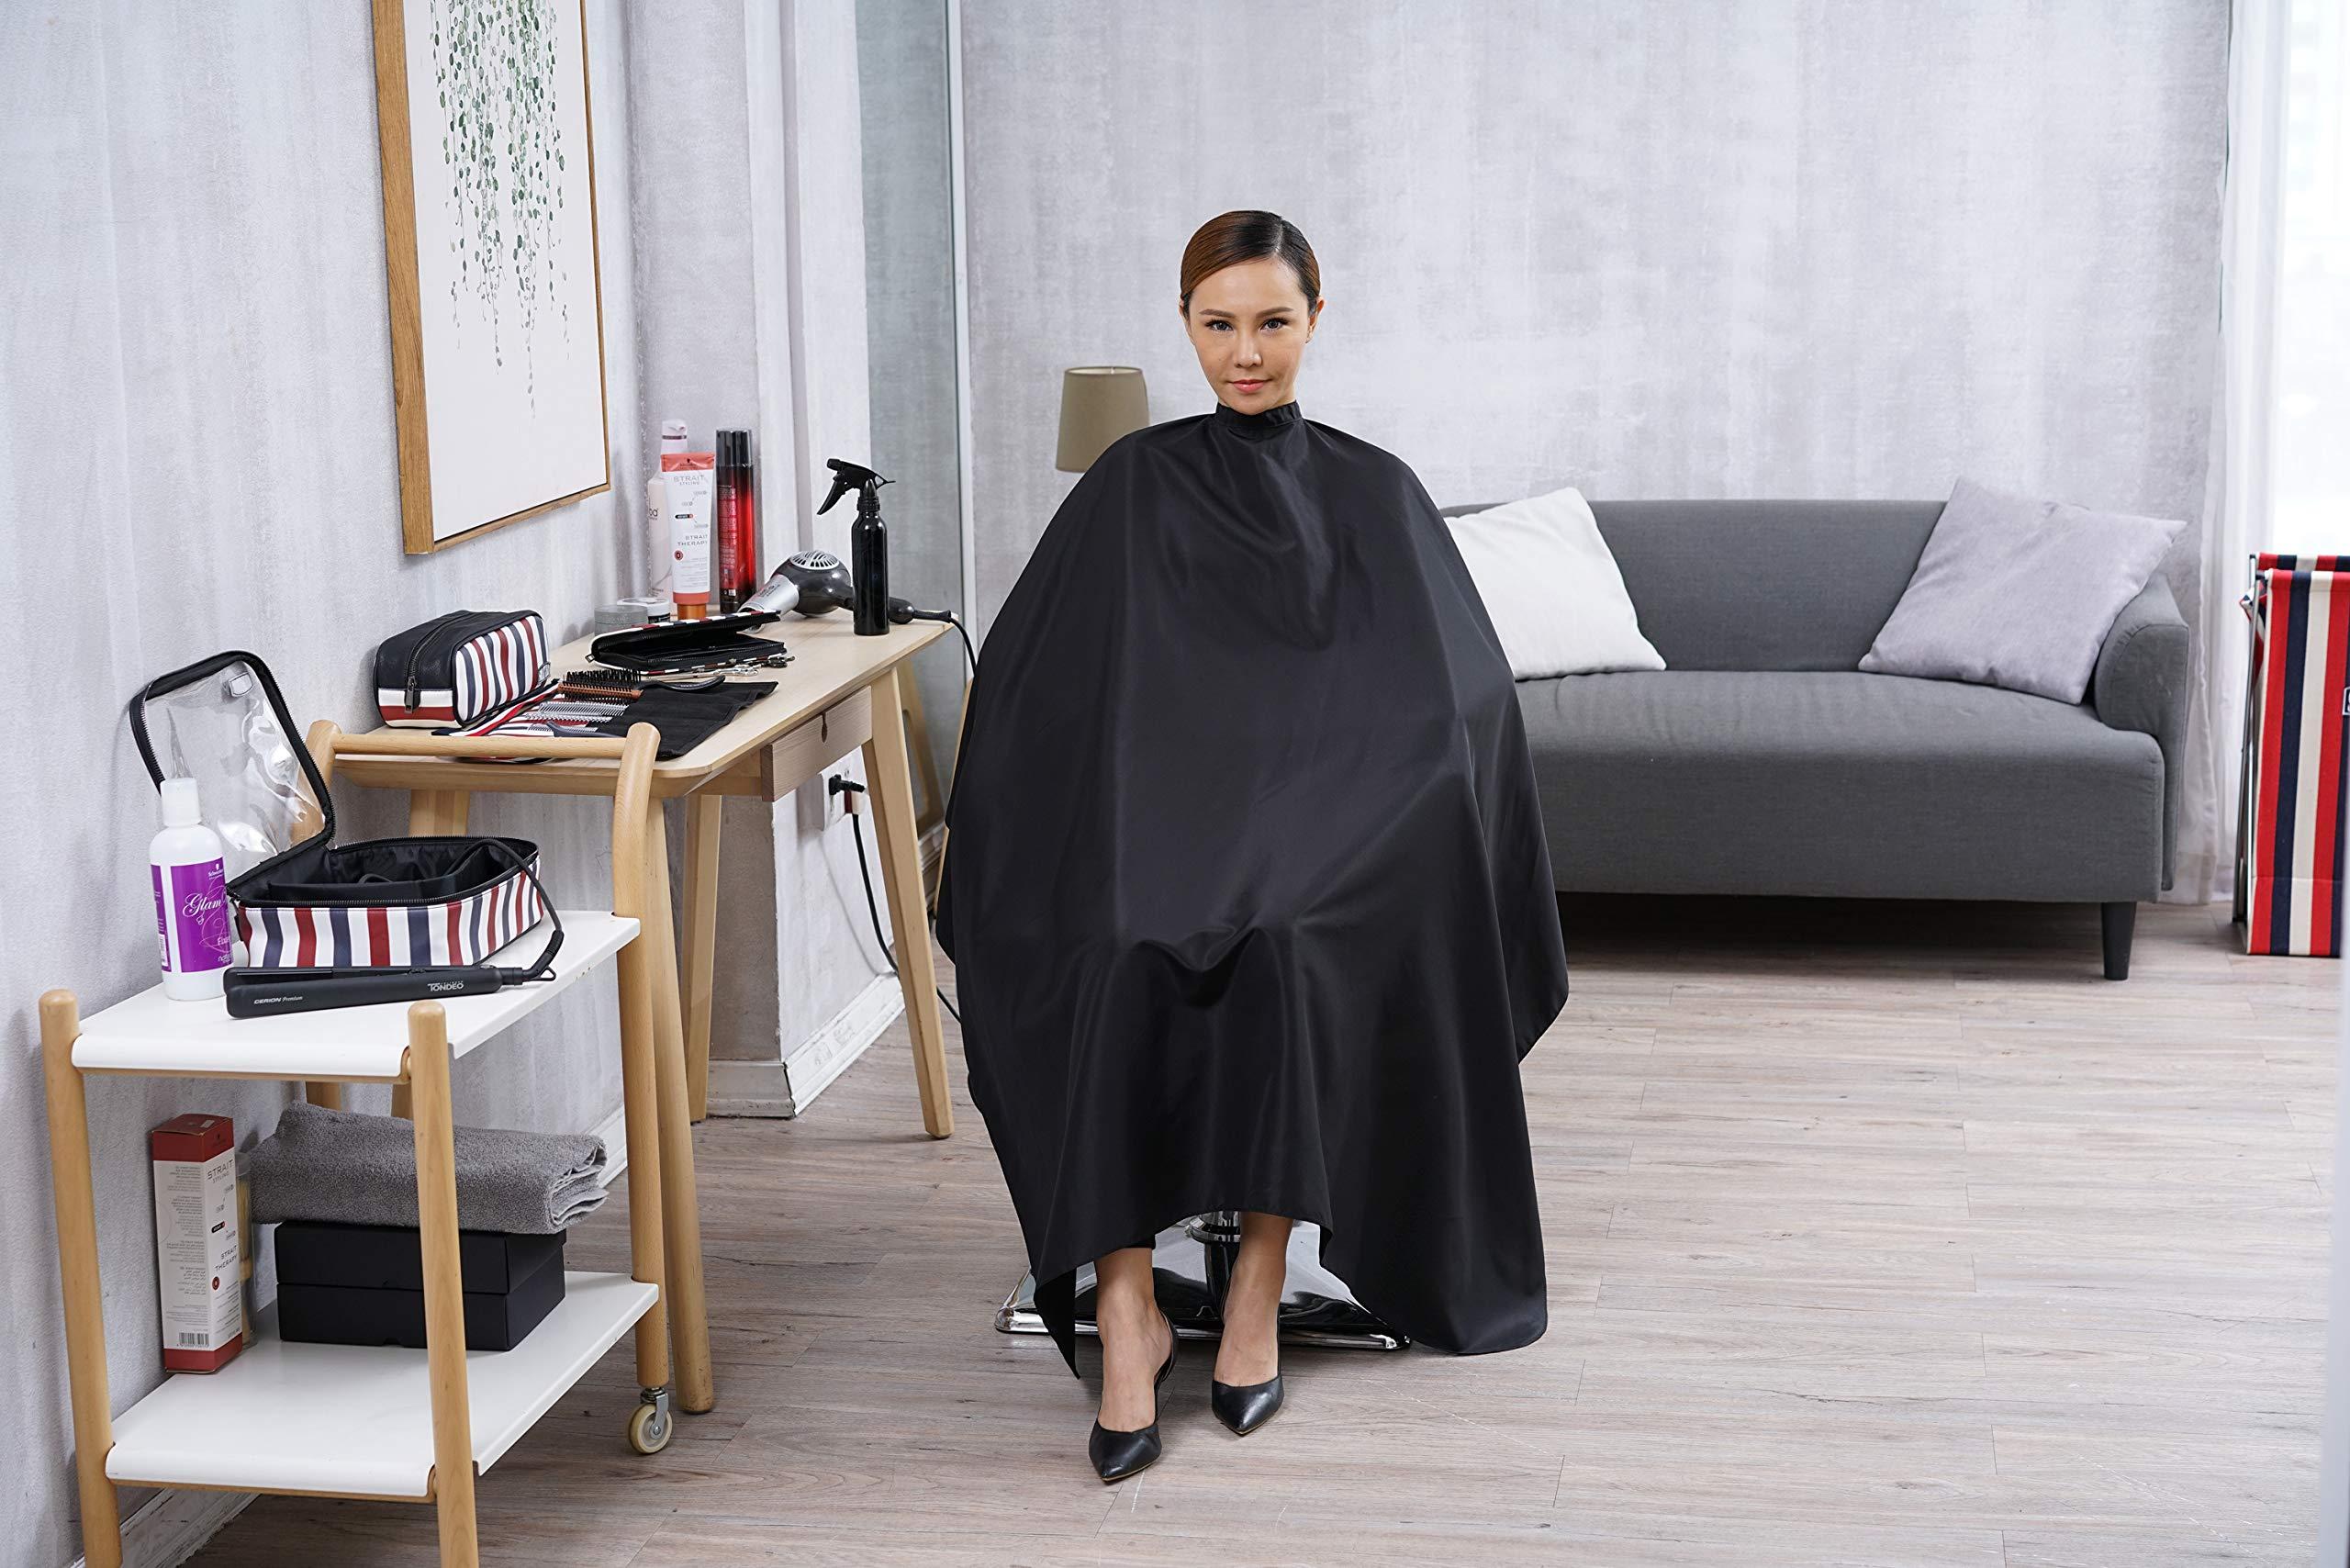 SMARTHAIR Professional Salon Cape Polyester Haircut Apron Hair Cut Cape,54''x62'',Black,C007001E-L by SMARTHAIR (Image #6)